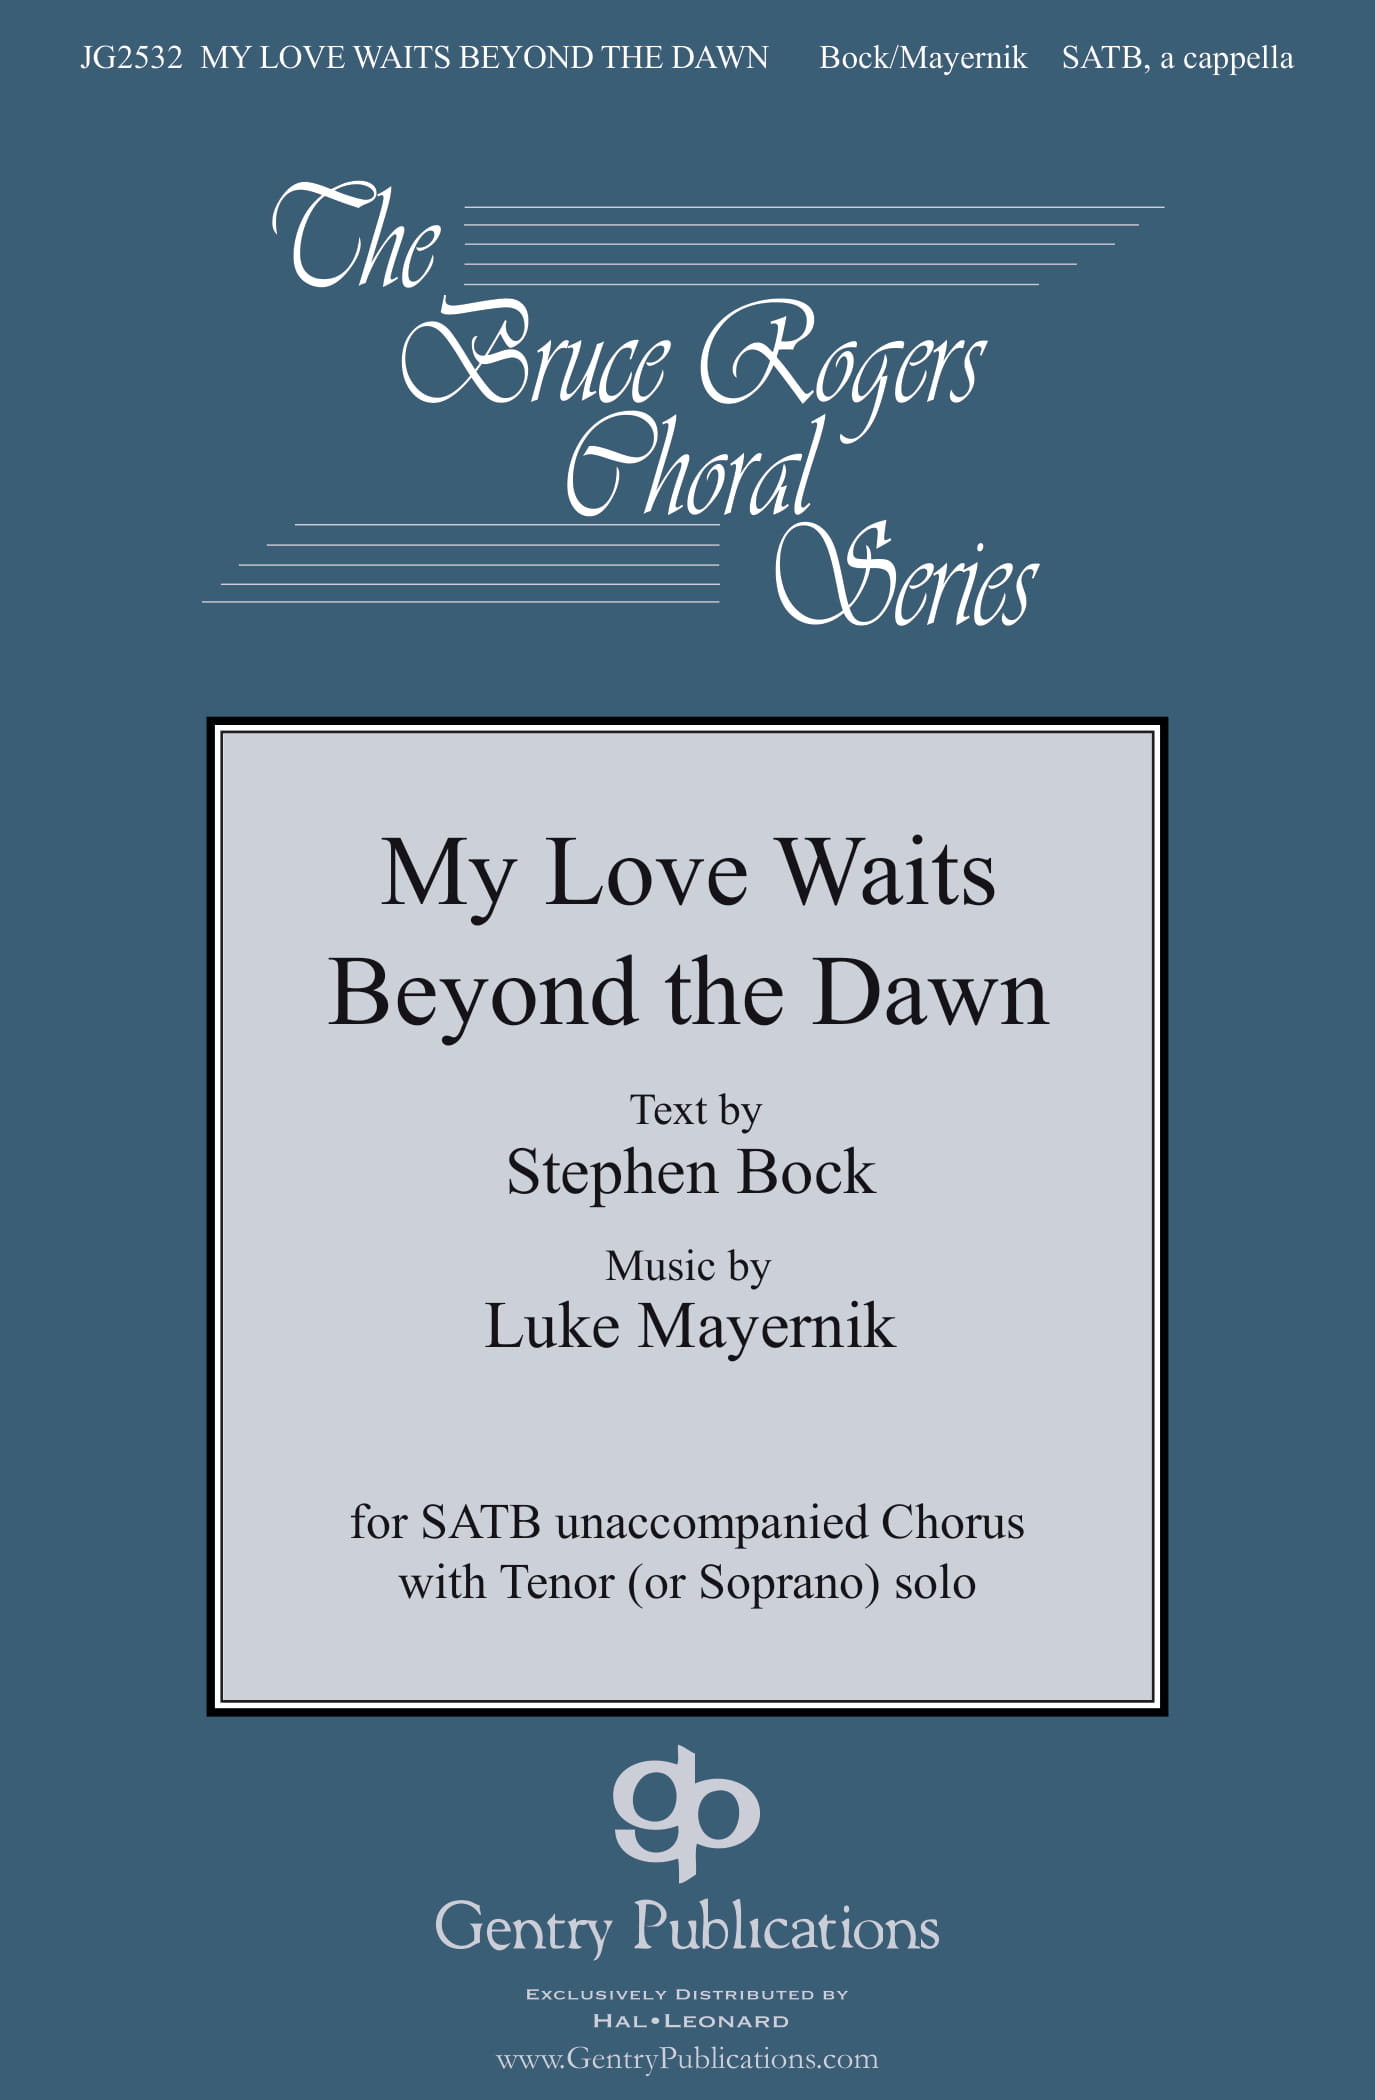 My Love Waits Beyond The Dawn